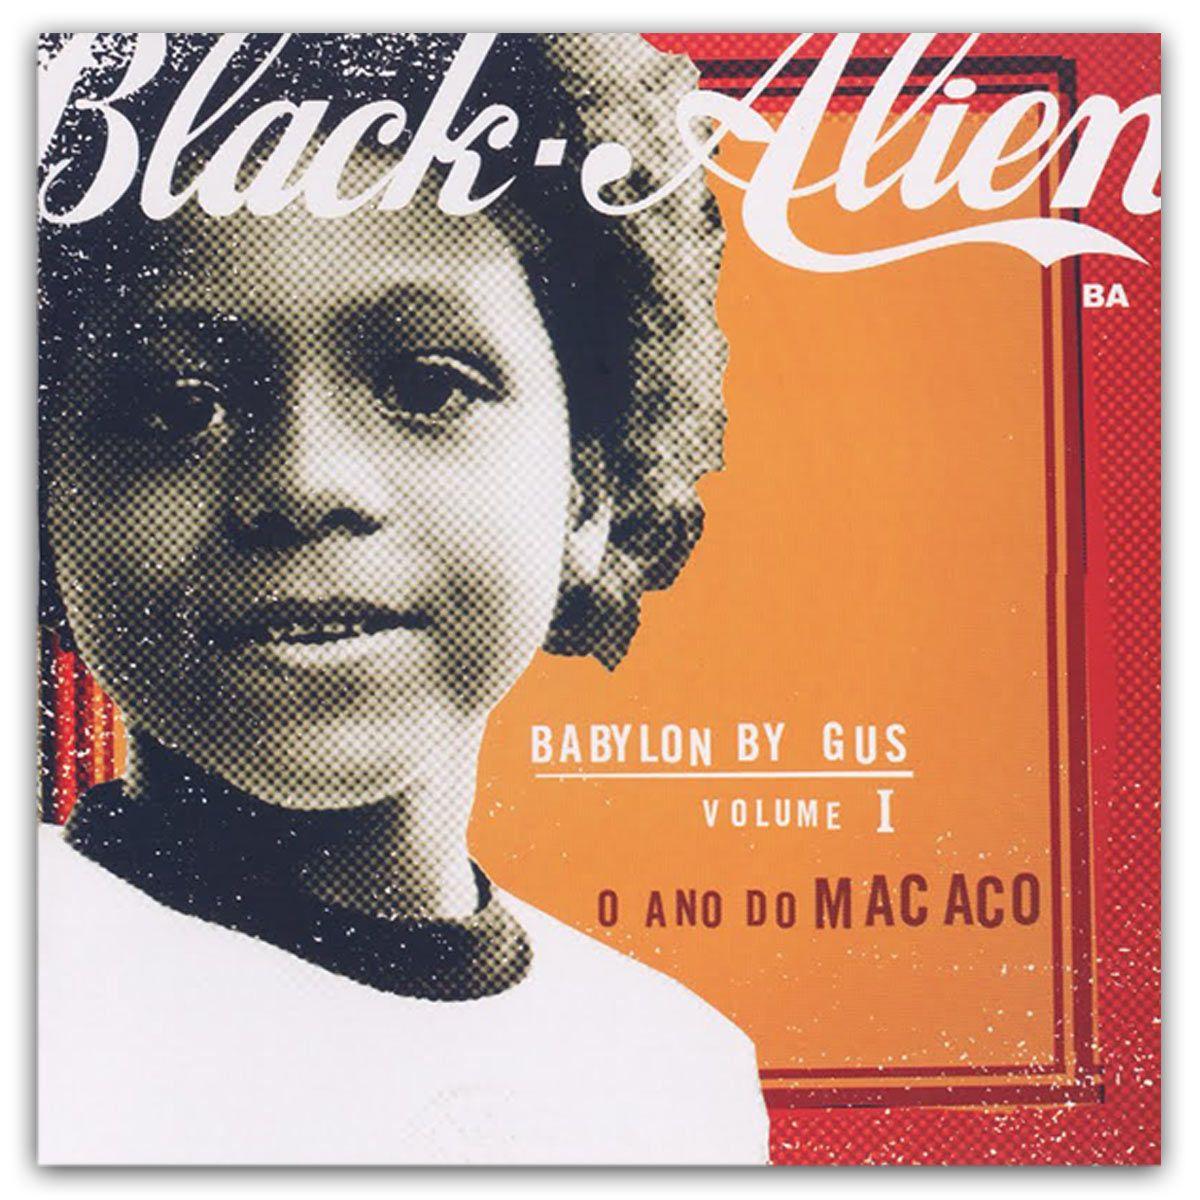 LP Black-Alien Babylon By Gus Volume 1 O Ano do Macaco